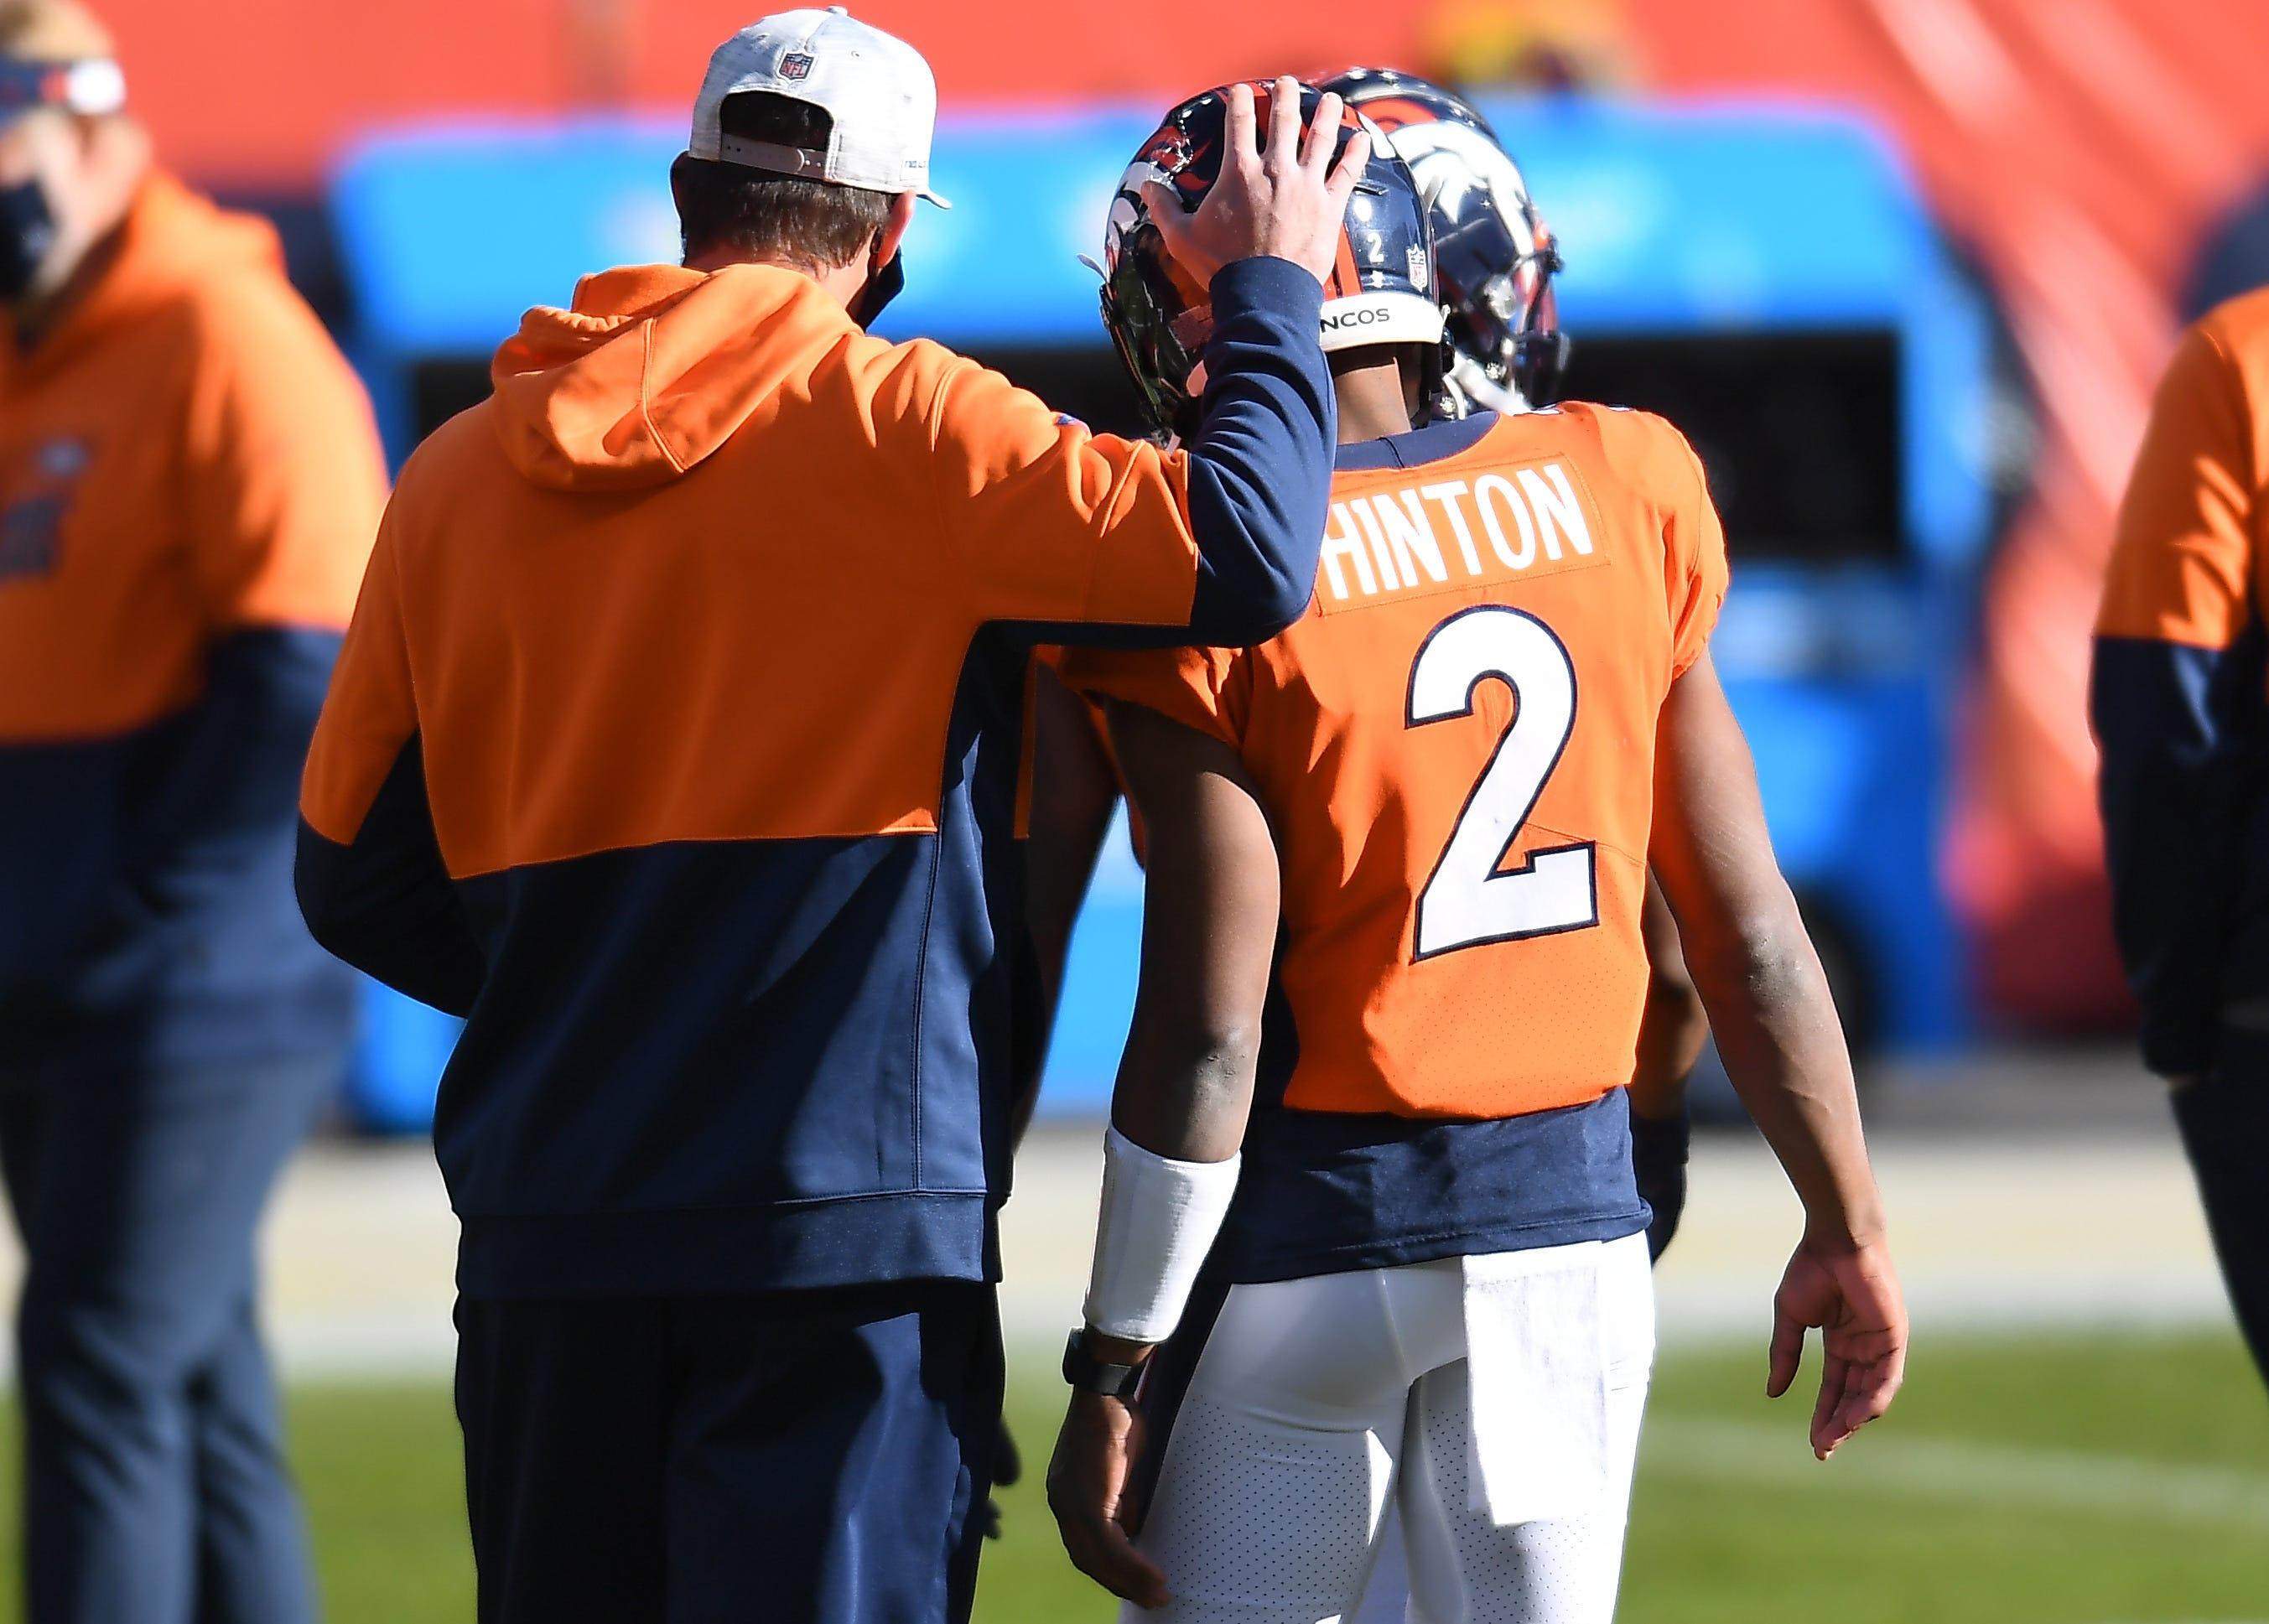 NFL Week 12's best photos